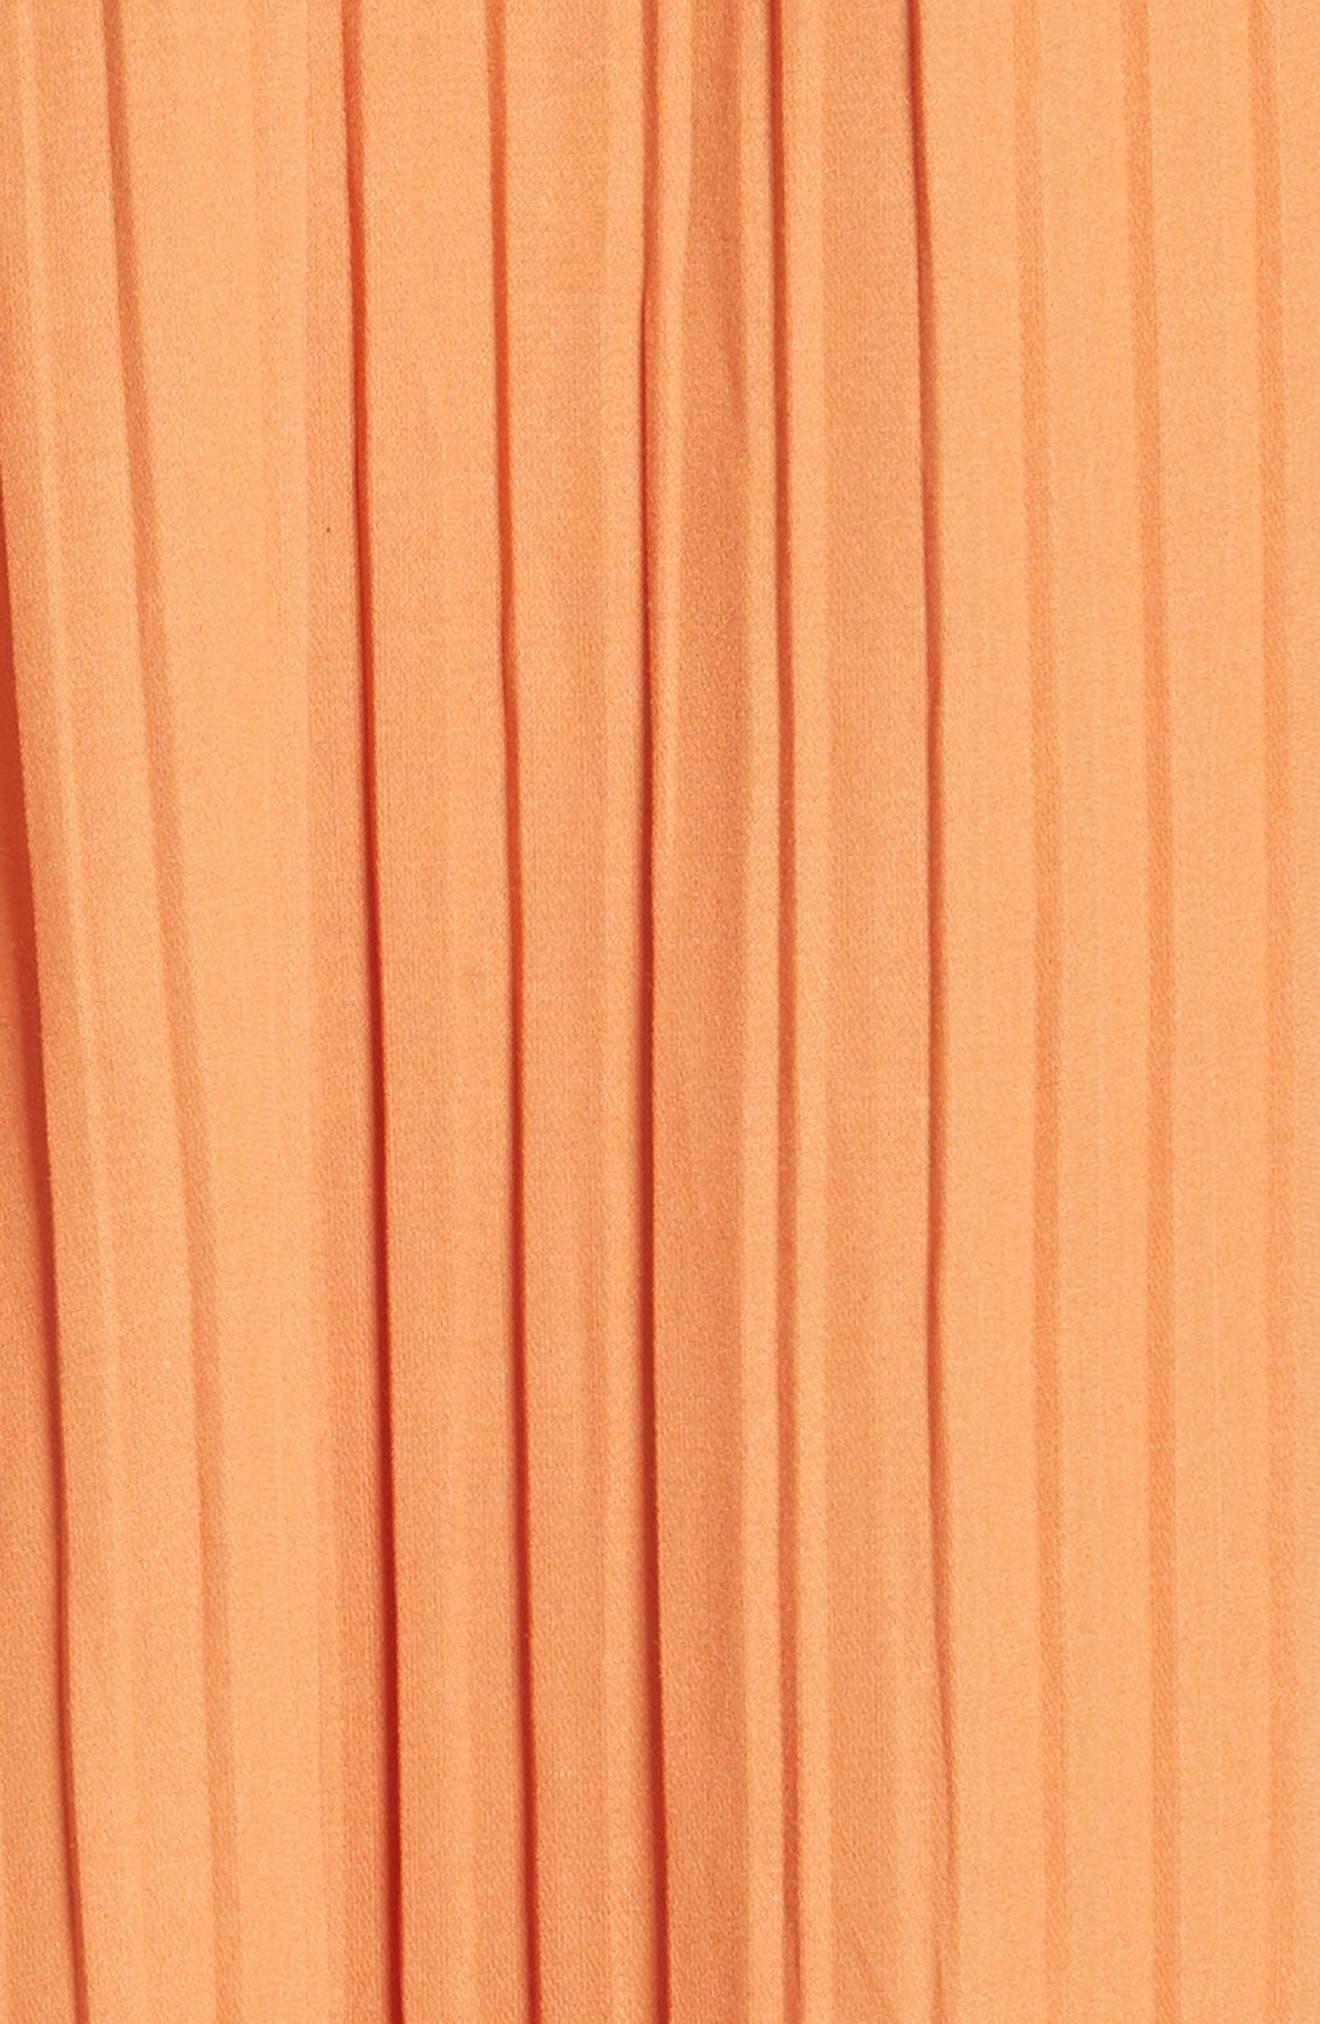 Asymmetrical Ruffle Trim Silk Blend Dress,                             Alternate thumbnail 5, color,                             Orange